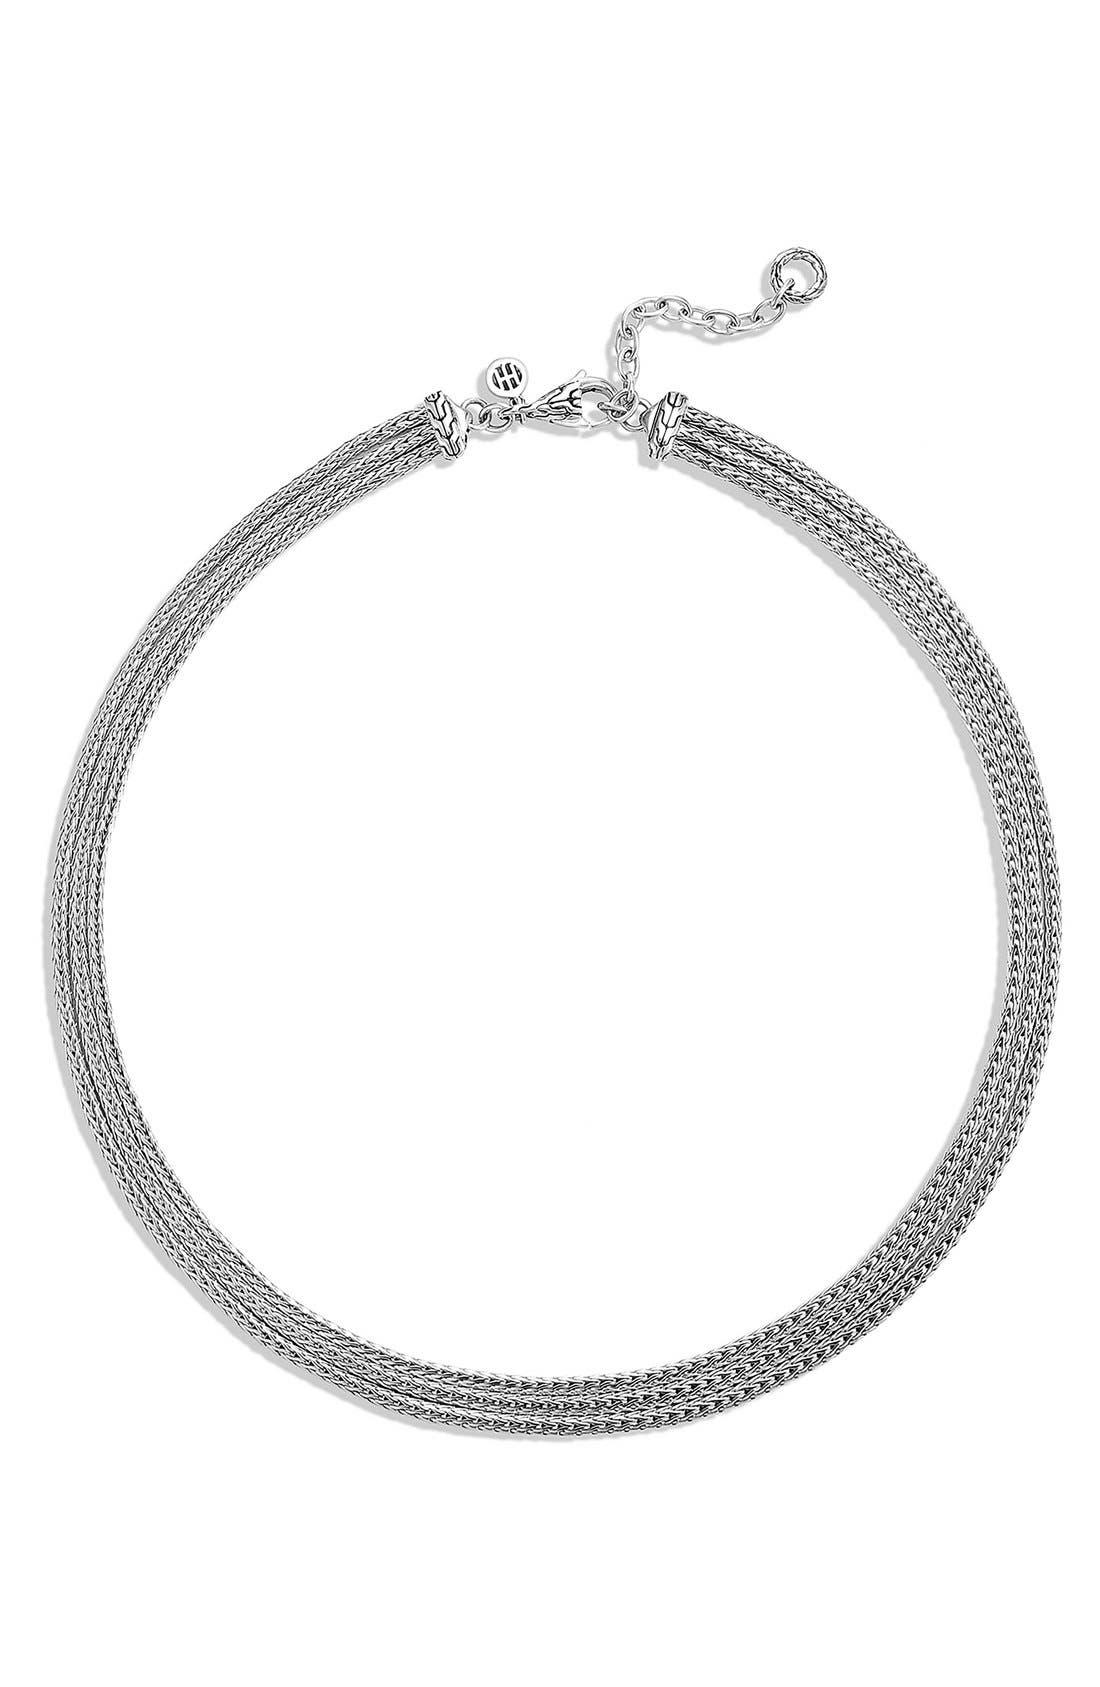 Main Image - John Hardy 'Classic Chain' Three Row Collar Necklace